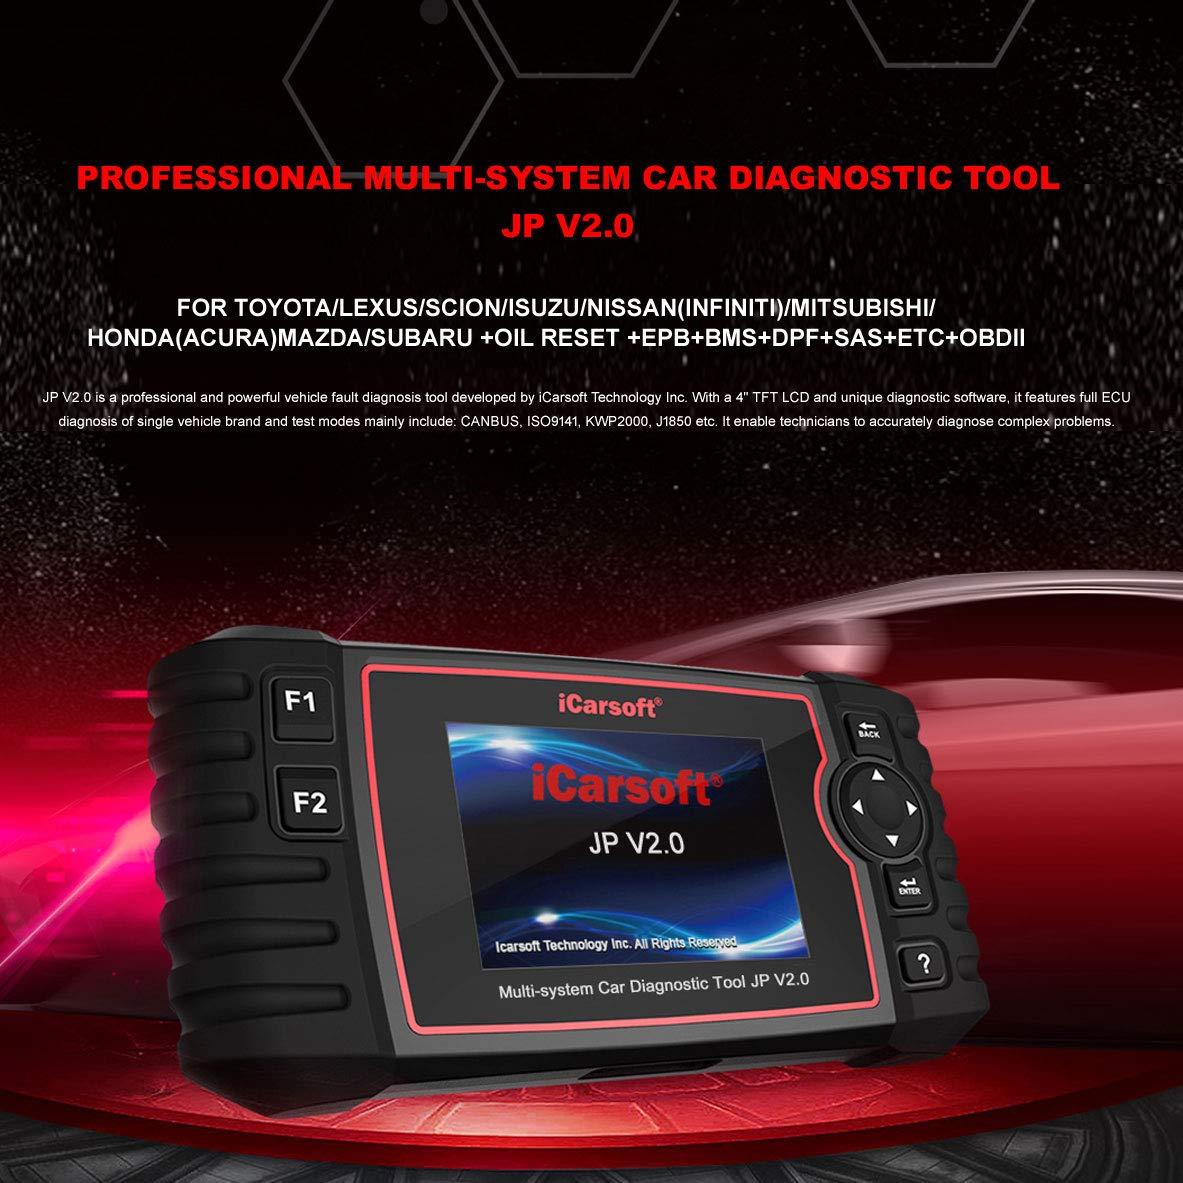 EPBMS+DPF+SAS+ETC+BLD+INJ Acura reinicio de Aceite iCarsoft JP V2.0 Herramienta de diagn/óstico para veh/ículos japoneses Toyota//Lexus//Scion//Isuzu//Nissan//Infiniti//Mitsubishi//Honda //Mazda//Subaru